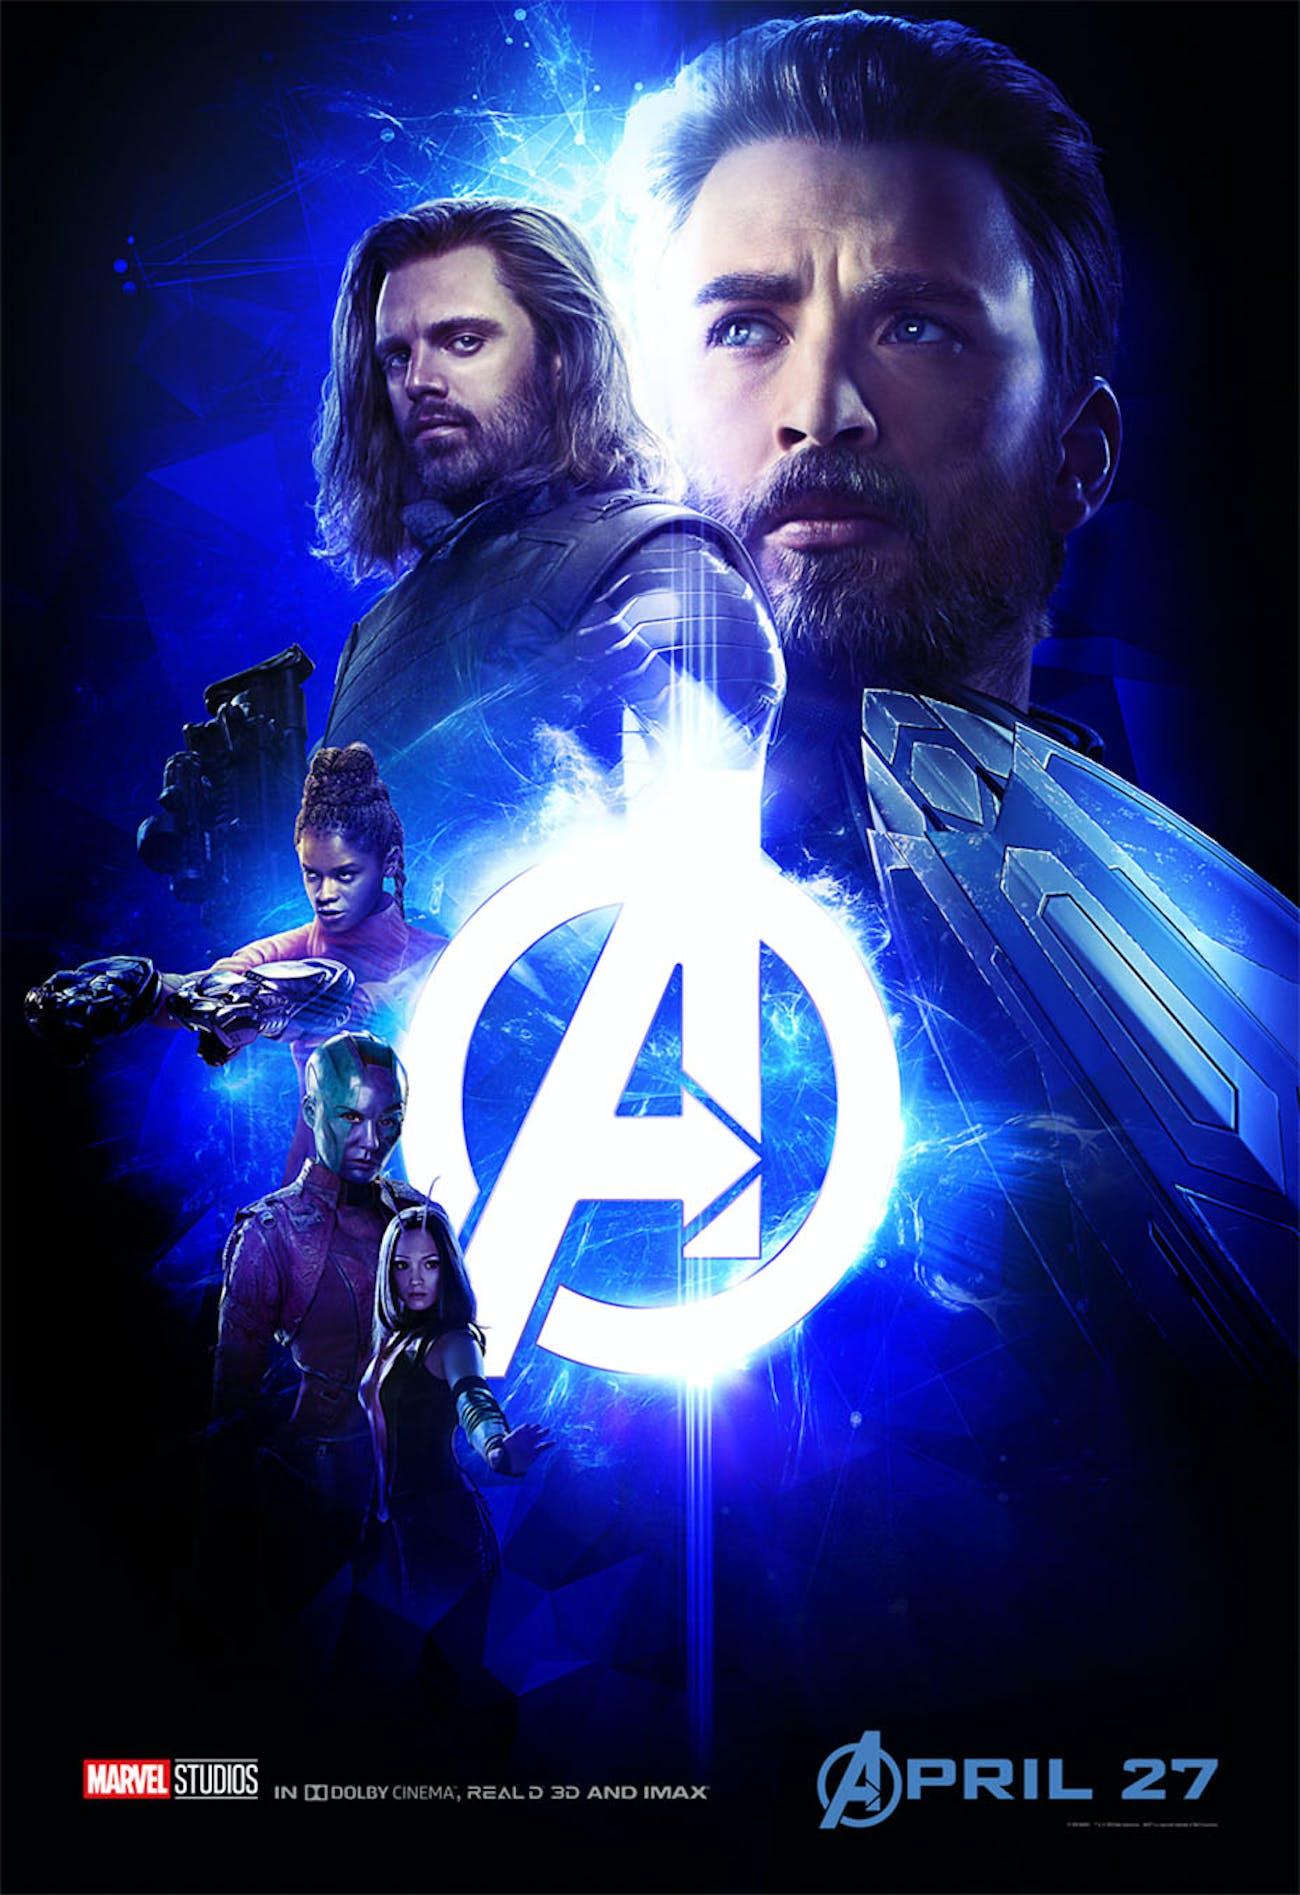 Blue 'Infinity War' poster has Captain America, Bucky, Shuri, Nebula, and Mantis.